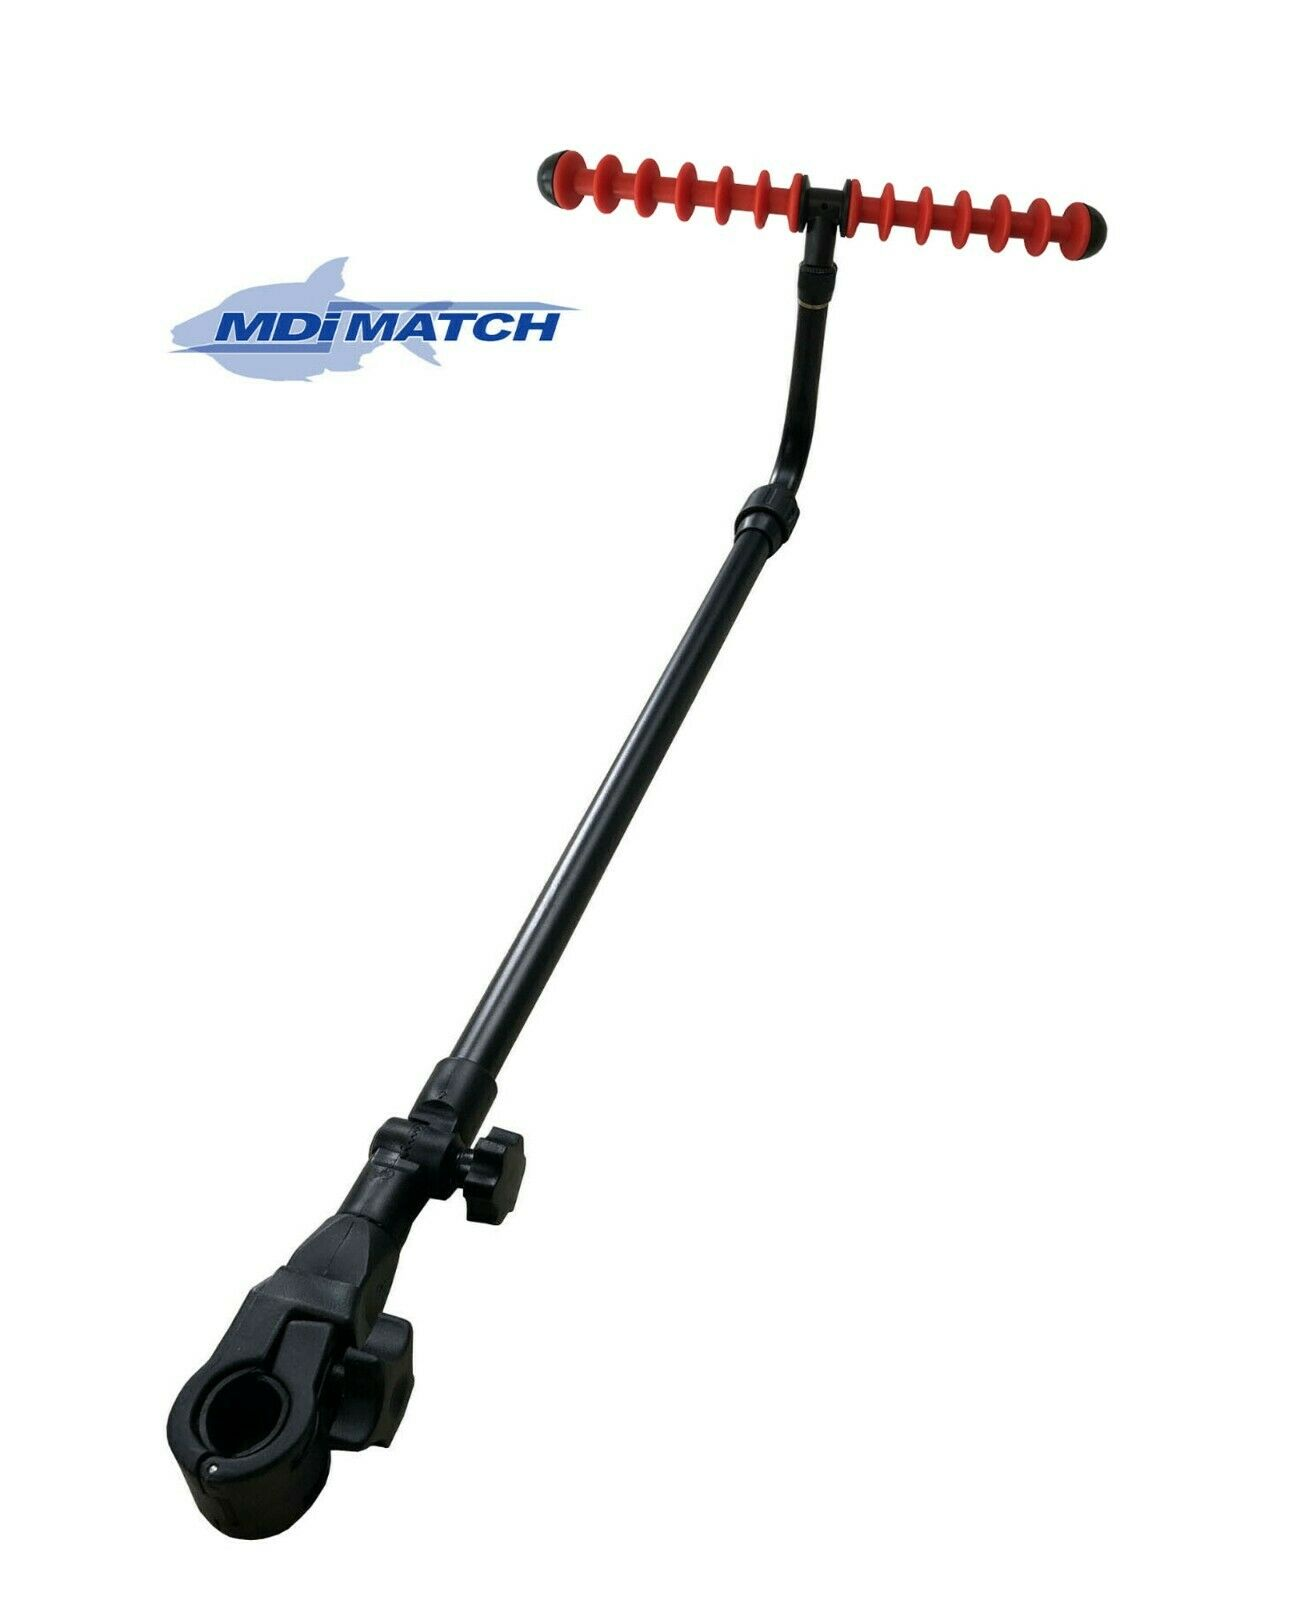 MDI Match Chair Extendable Adjustable Tilt Fishing Feeder Arm Rest /& Red Rest